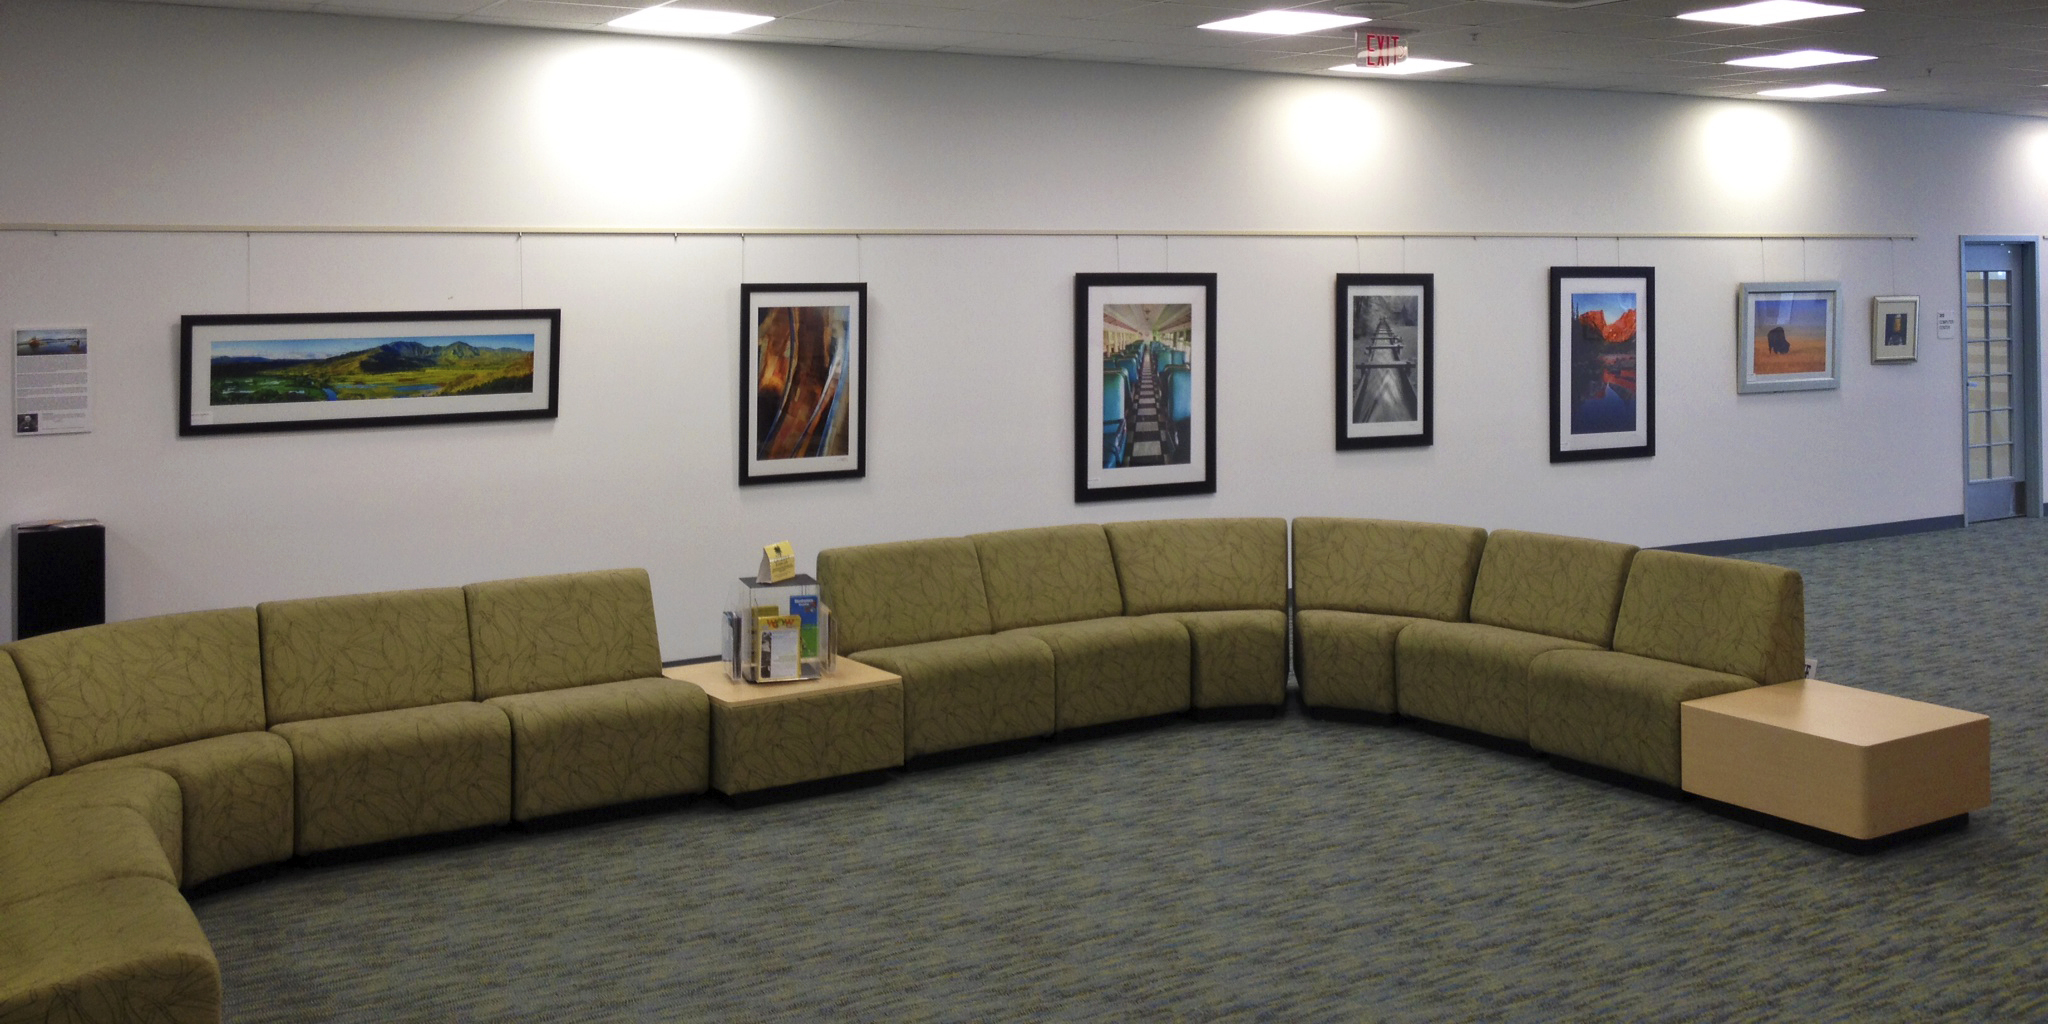 2014, 11-01 - Western Regional Library 01.jpg